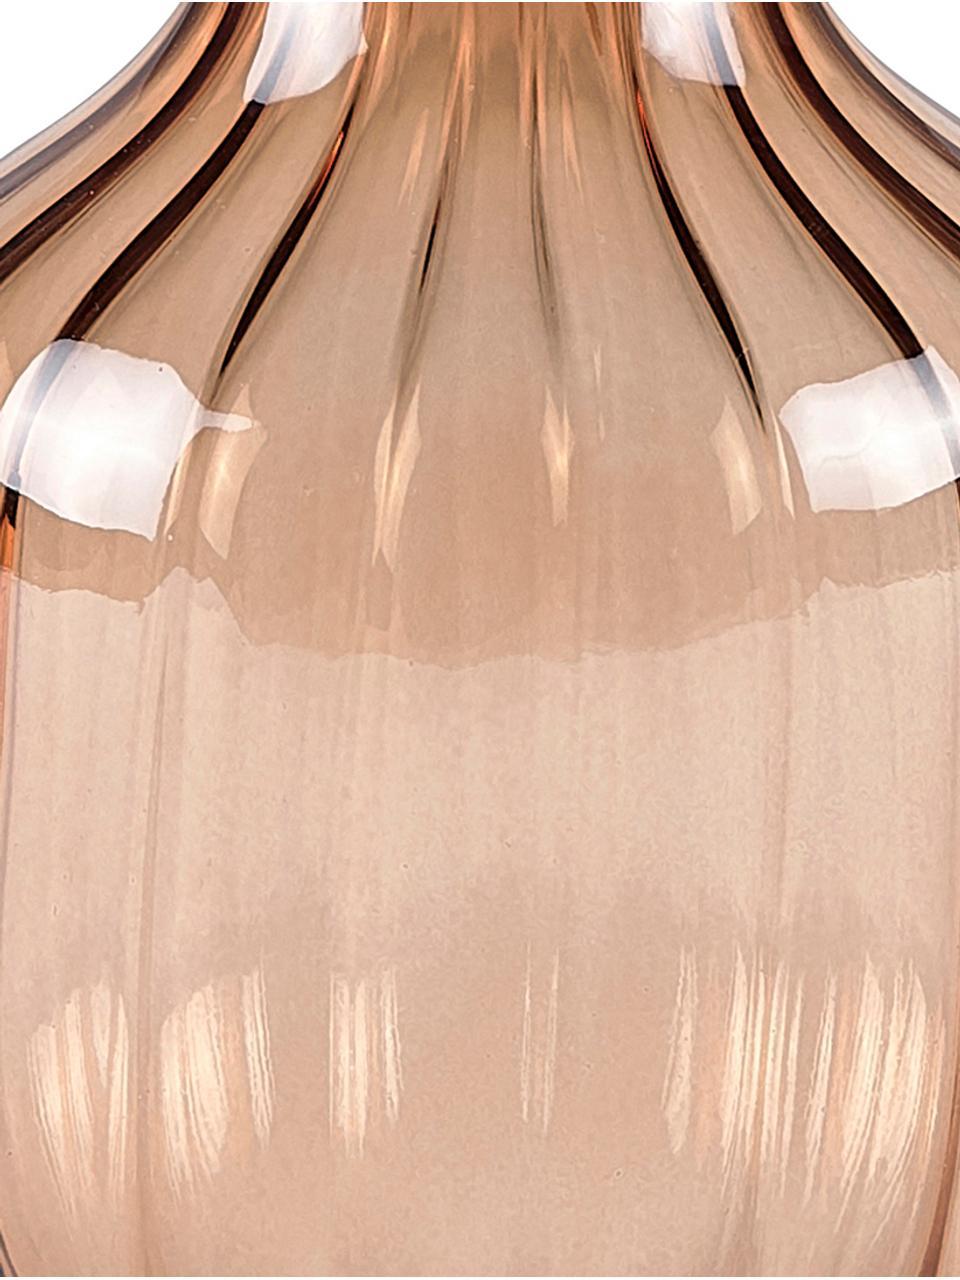 Glas-Vase Cameron, Glas, Braun, Ø 10 x H 13 cm